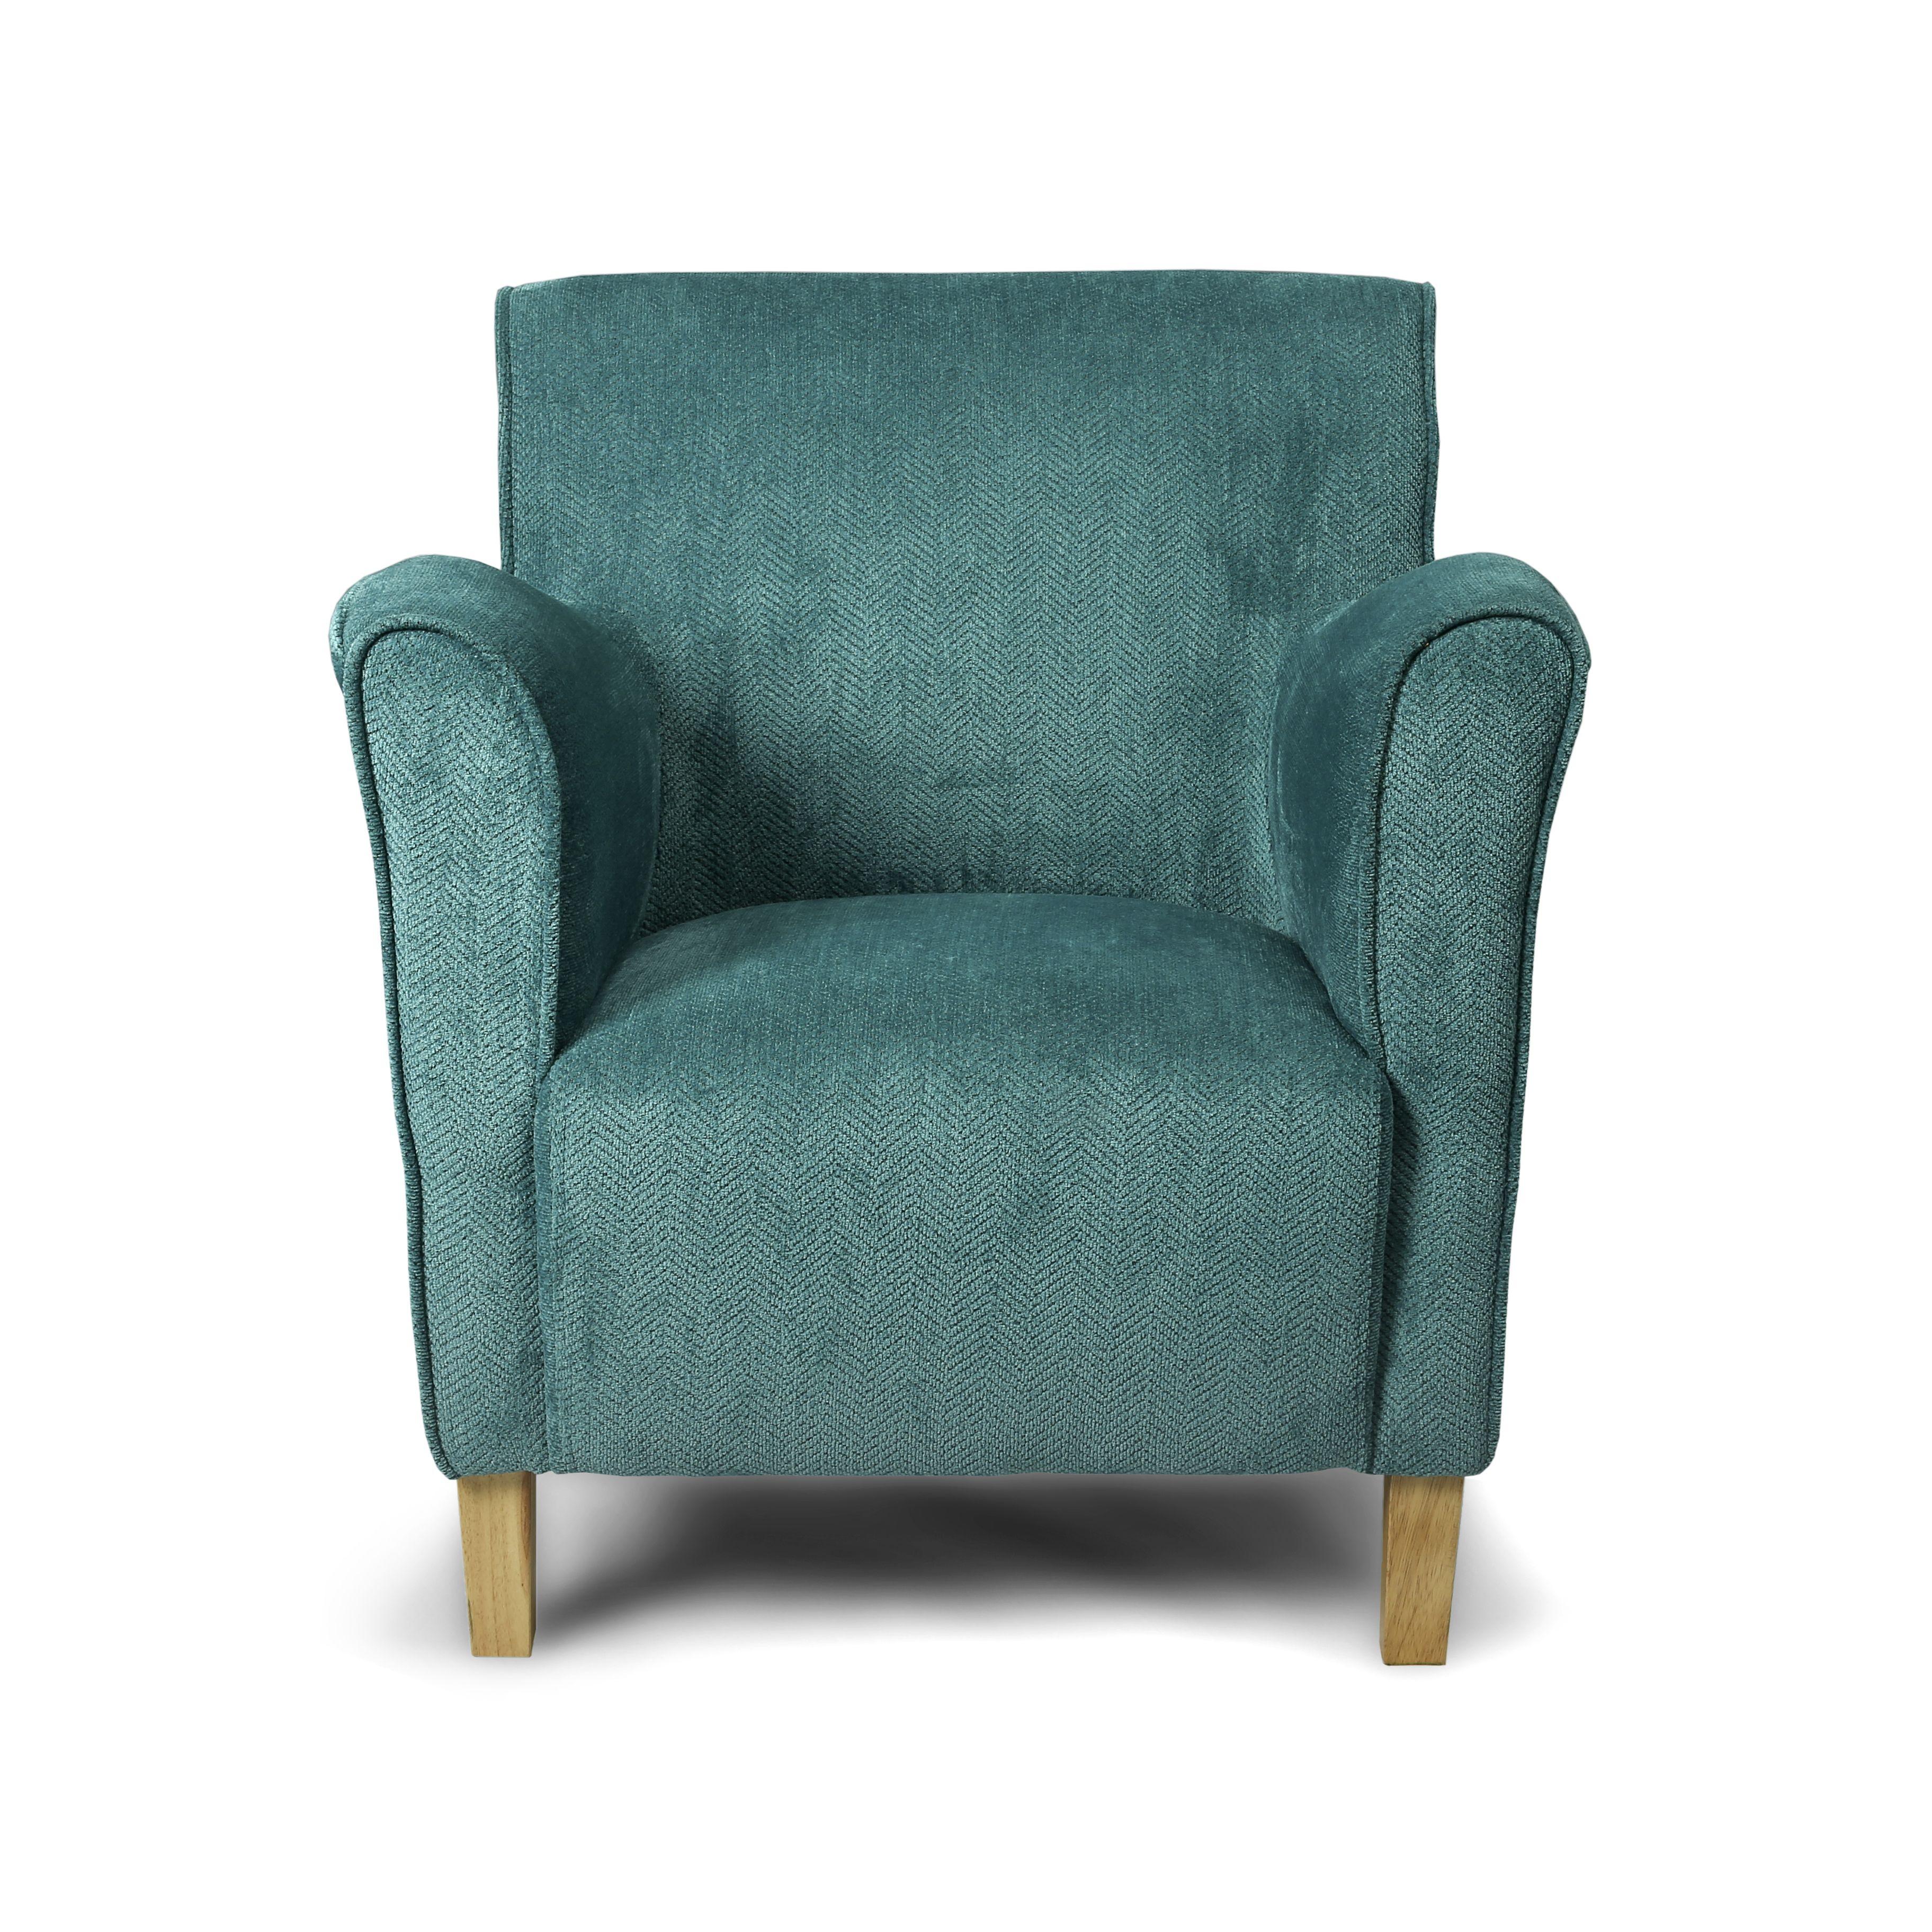 Varna Armchair Fabric armchairs, Armchair, Occasional chairs